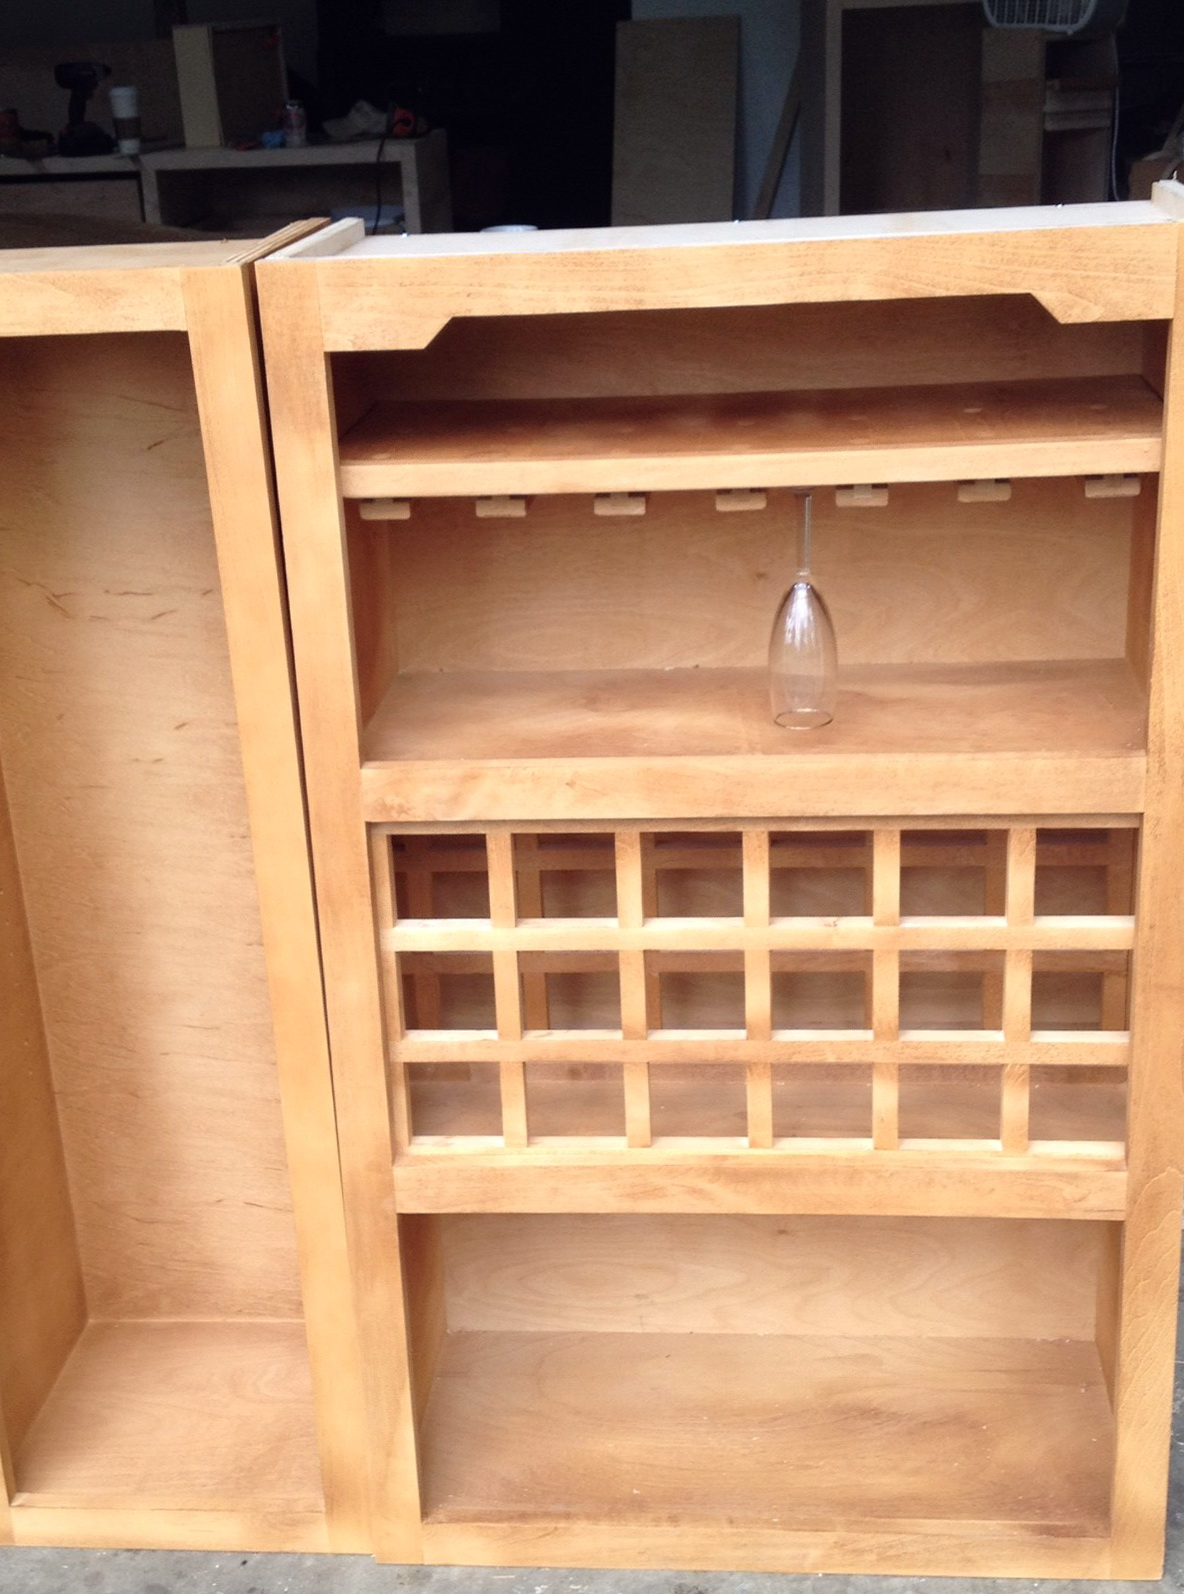 How To Build A Wine Rack Plans   Home Design Ideas